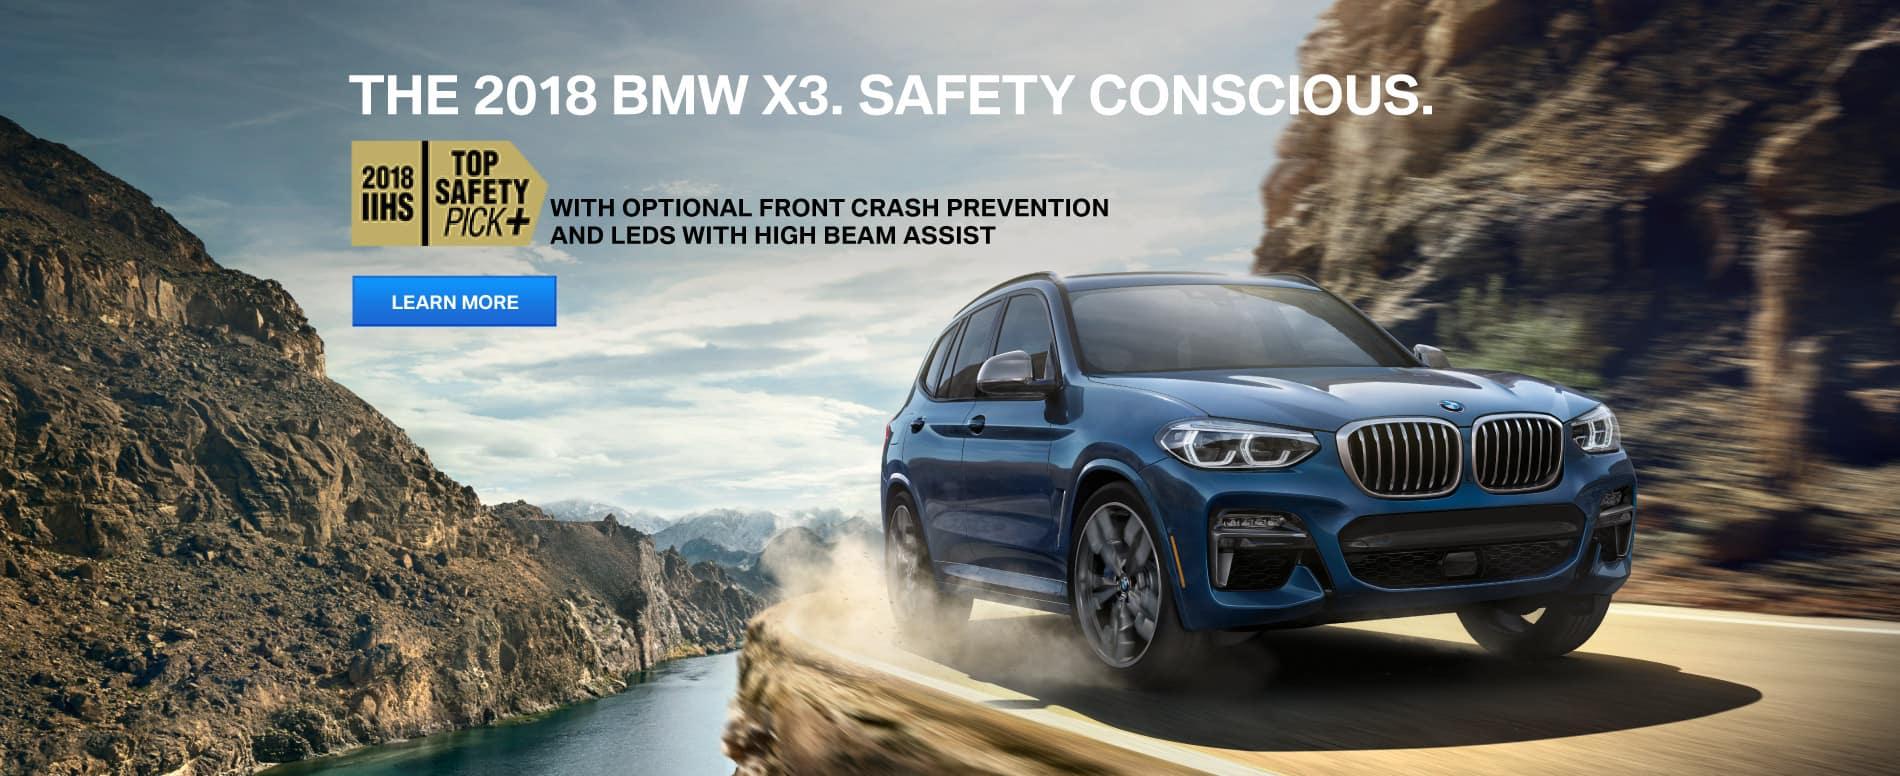 Autobahn BMW Fort Worth BMW Dealer In Fort Worth TX - Bmw plano car show